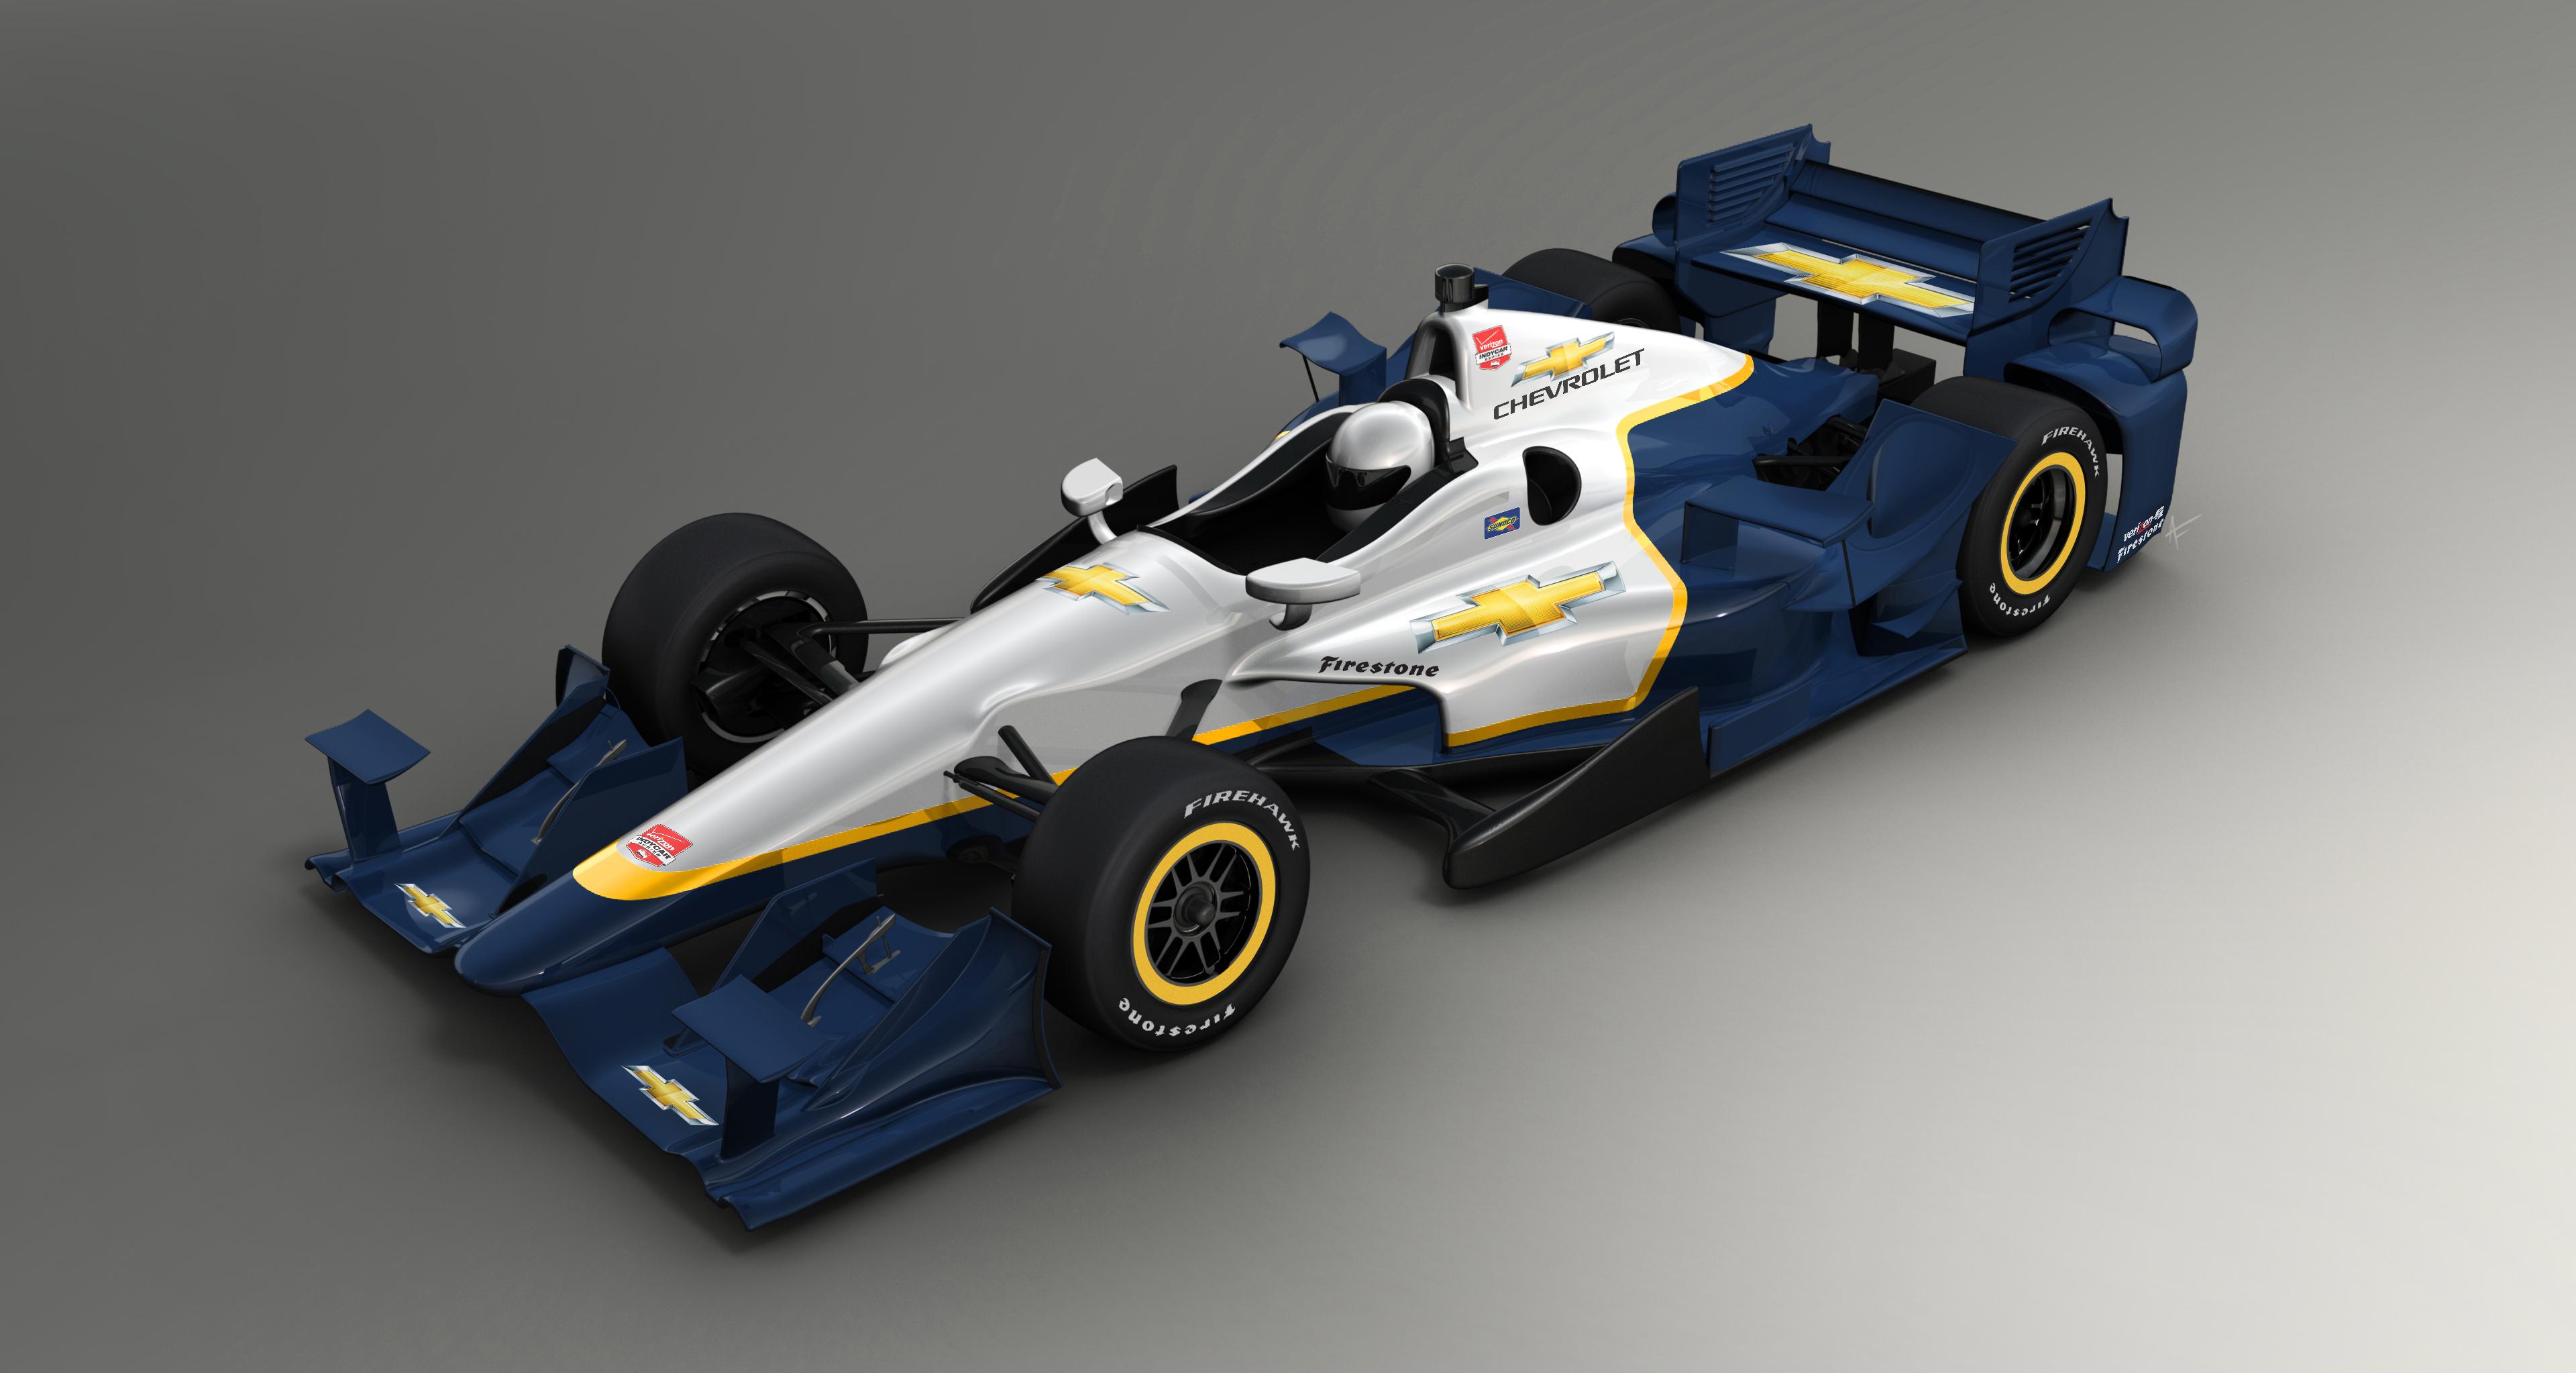 2015 Chevrolet Indycar Is A Balanced Aero Mix Between Drag